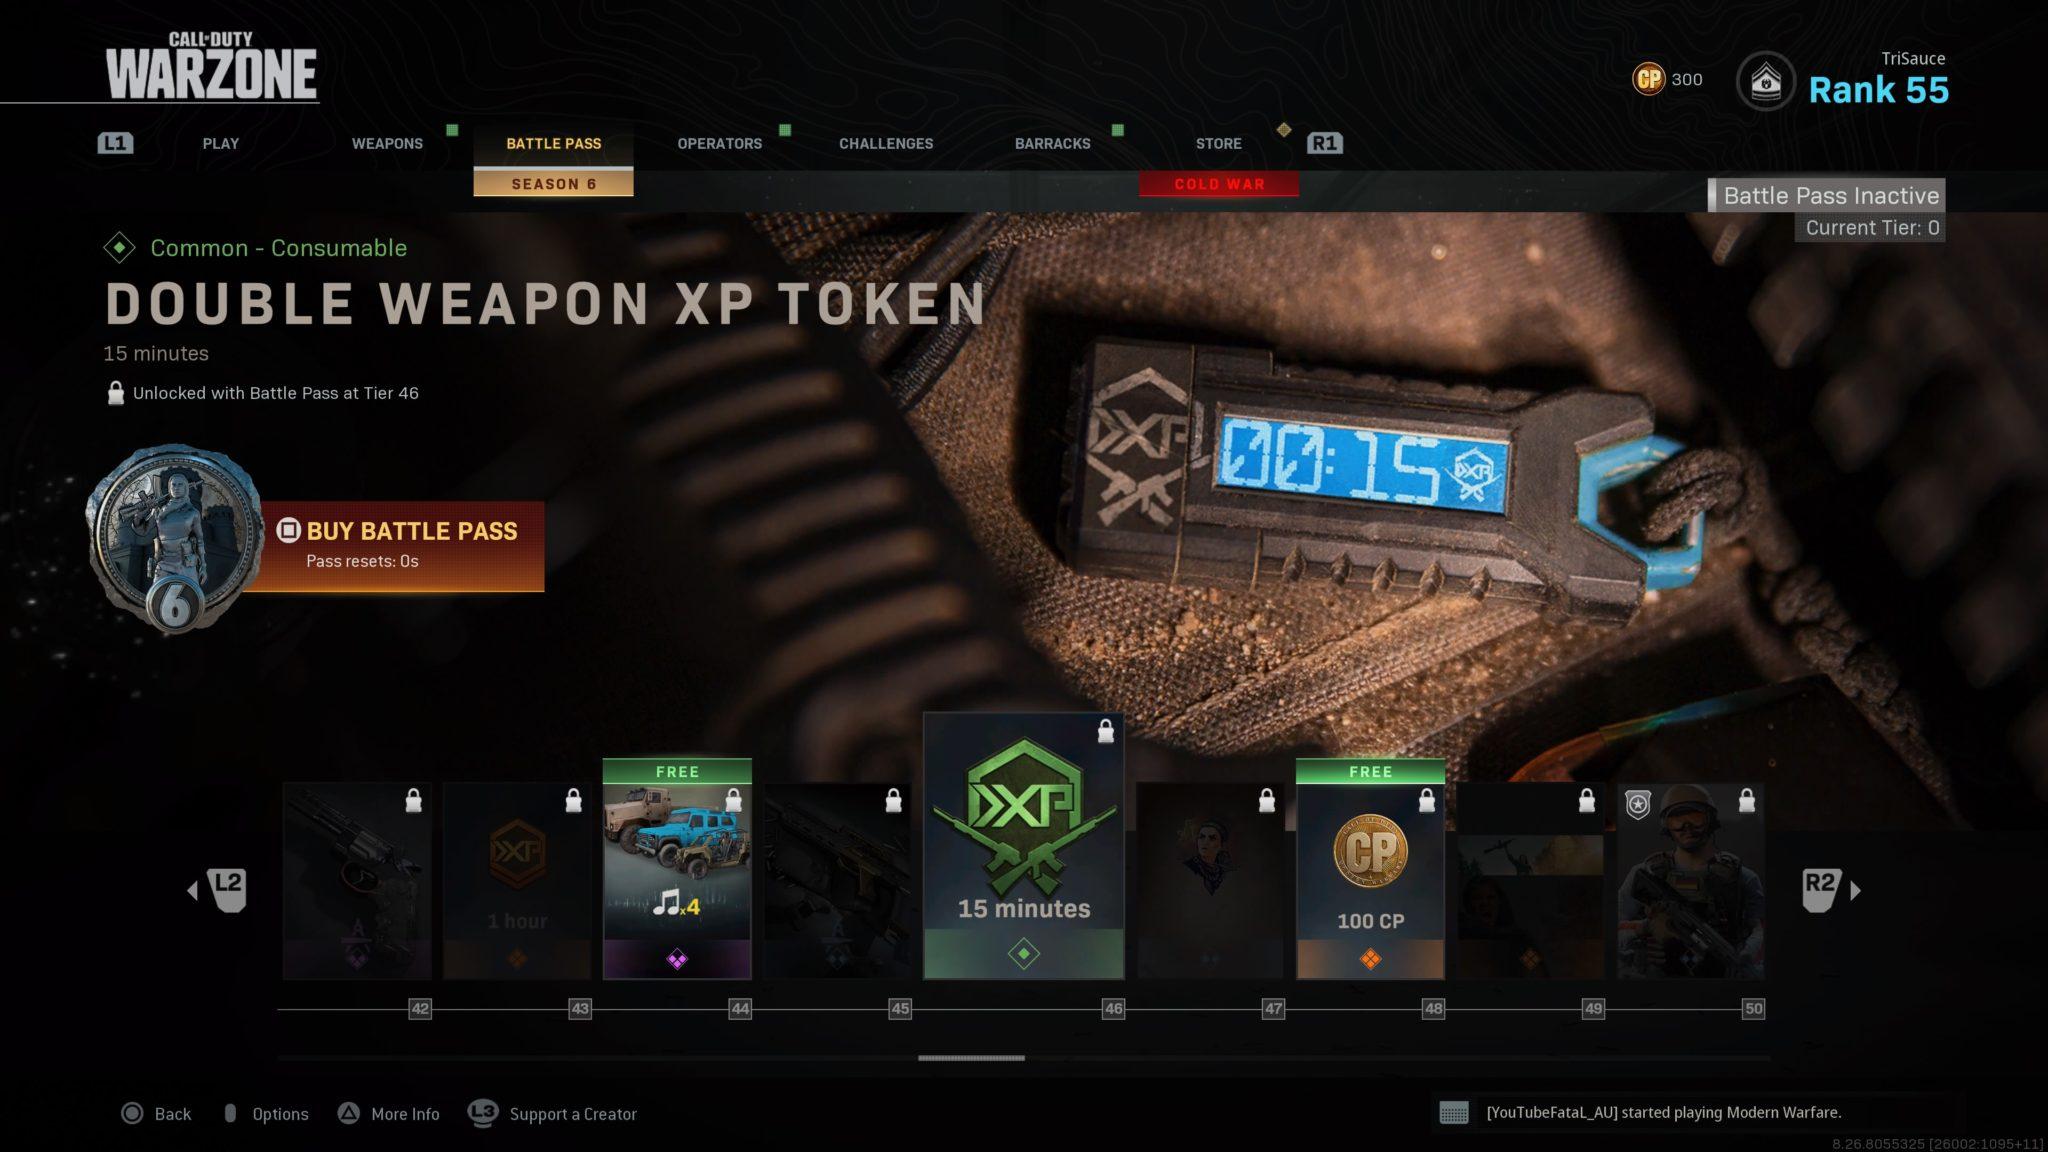 Warzone Season 6 Battle Pass